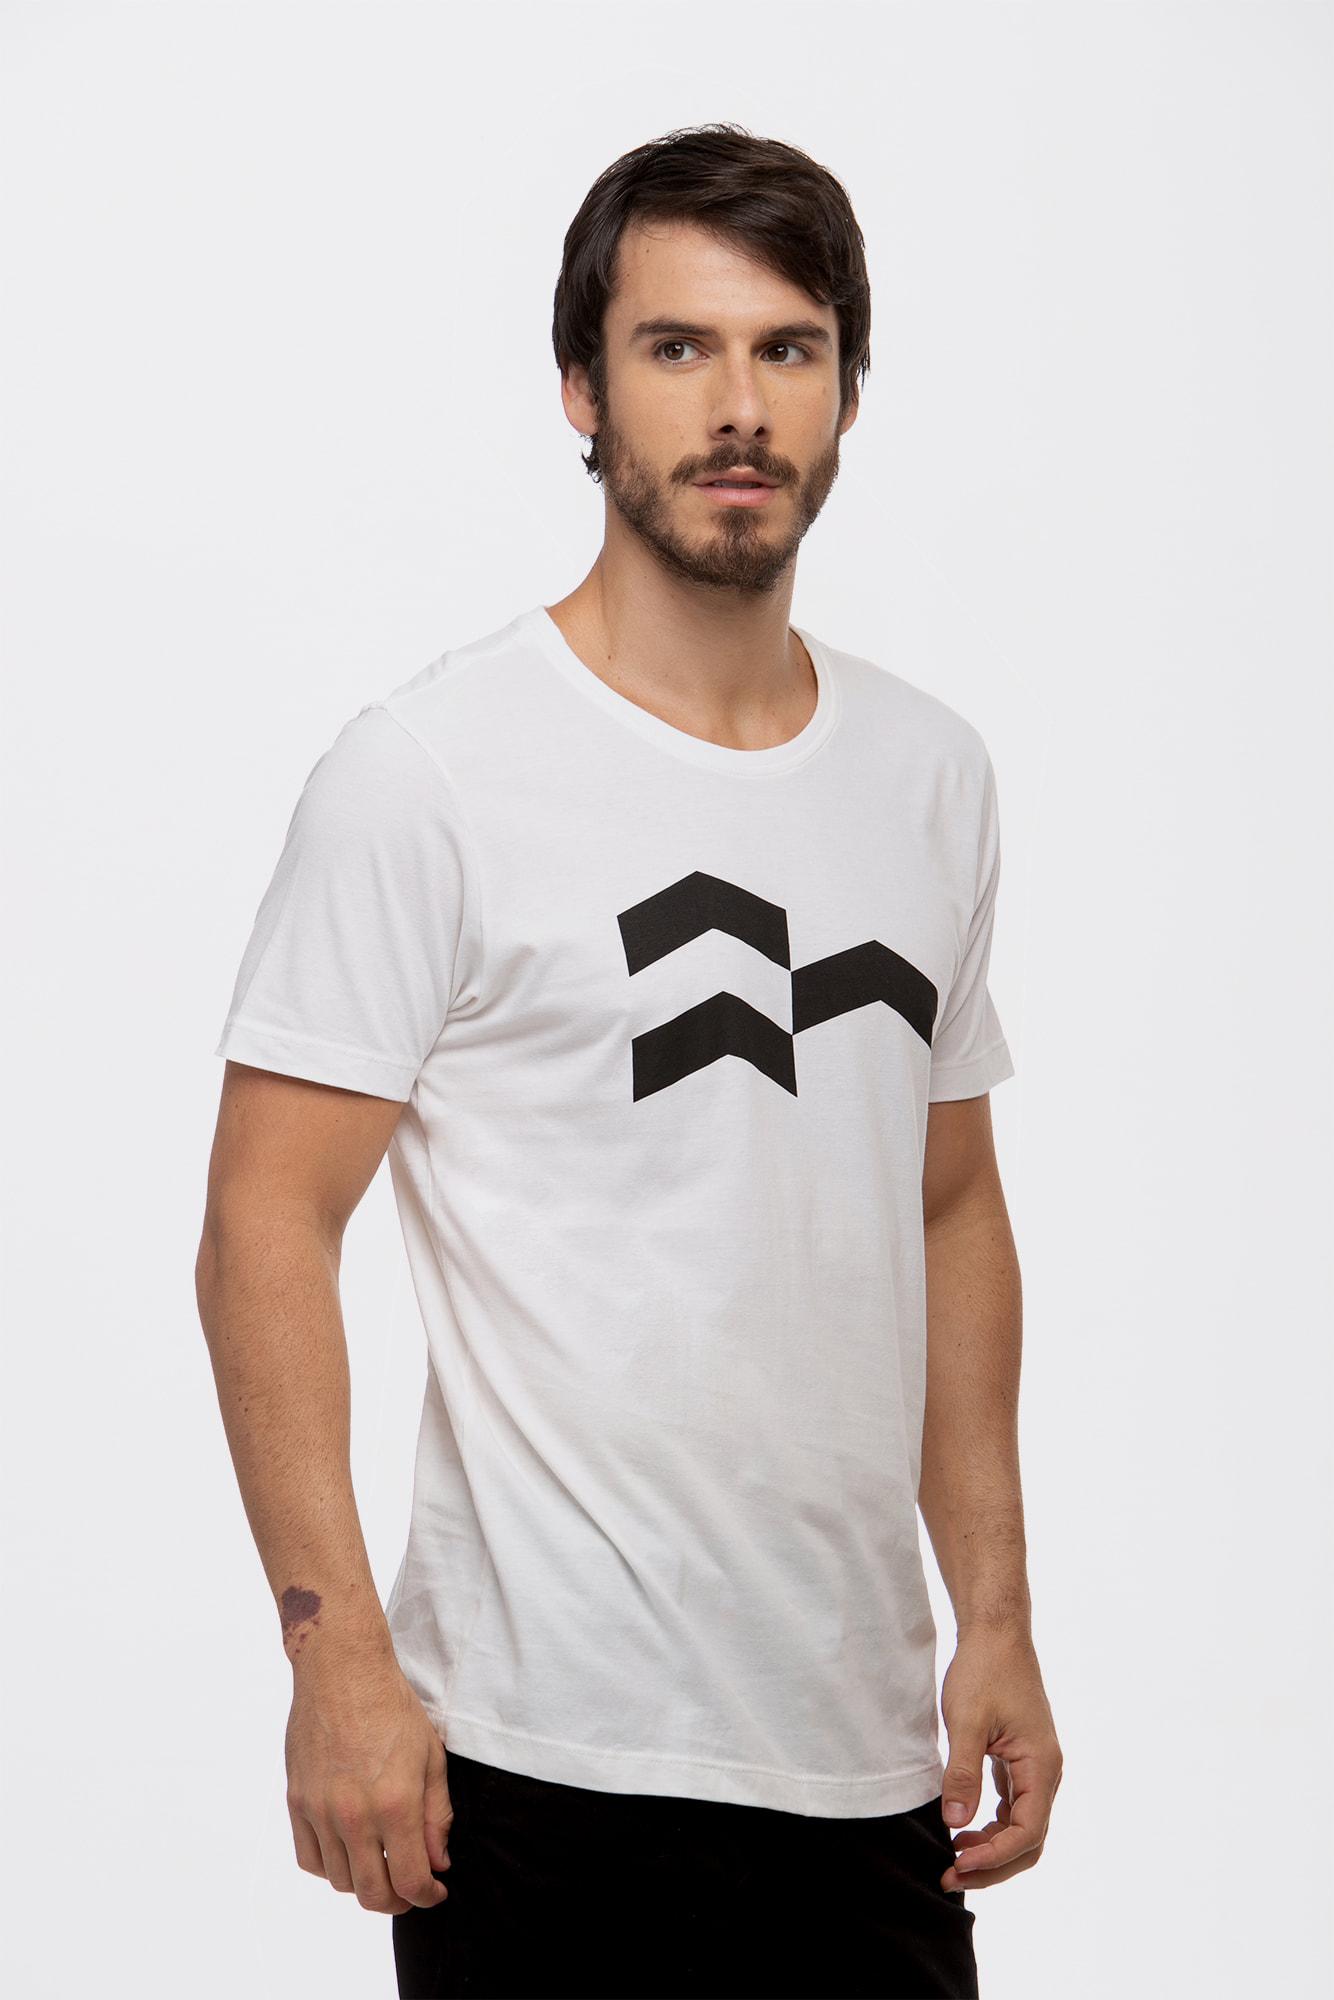 Camiseta Símbolo Gráfico Off